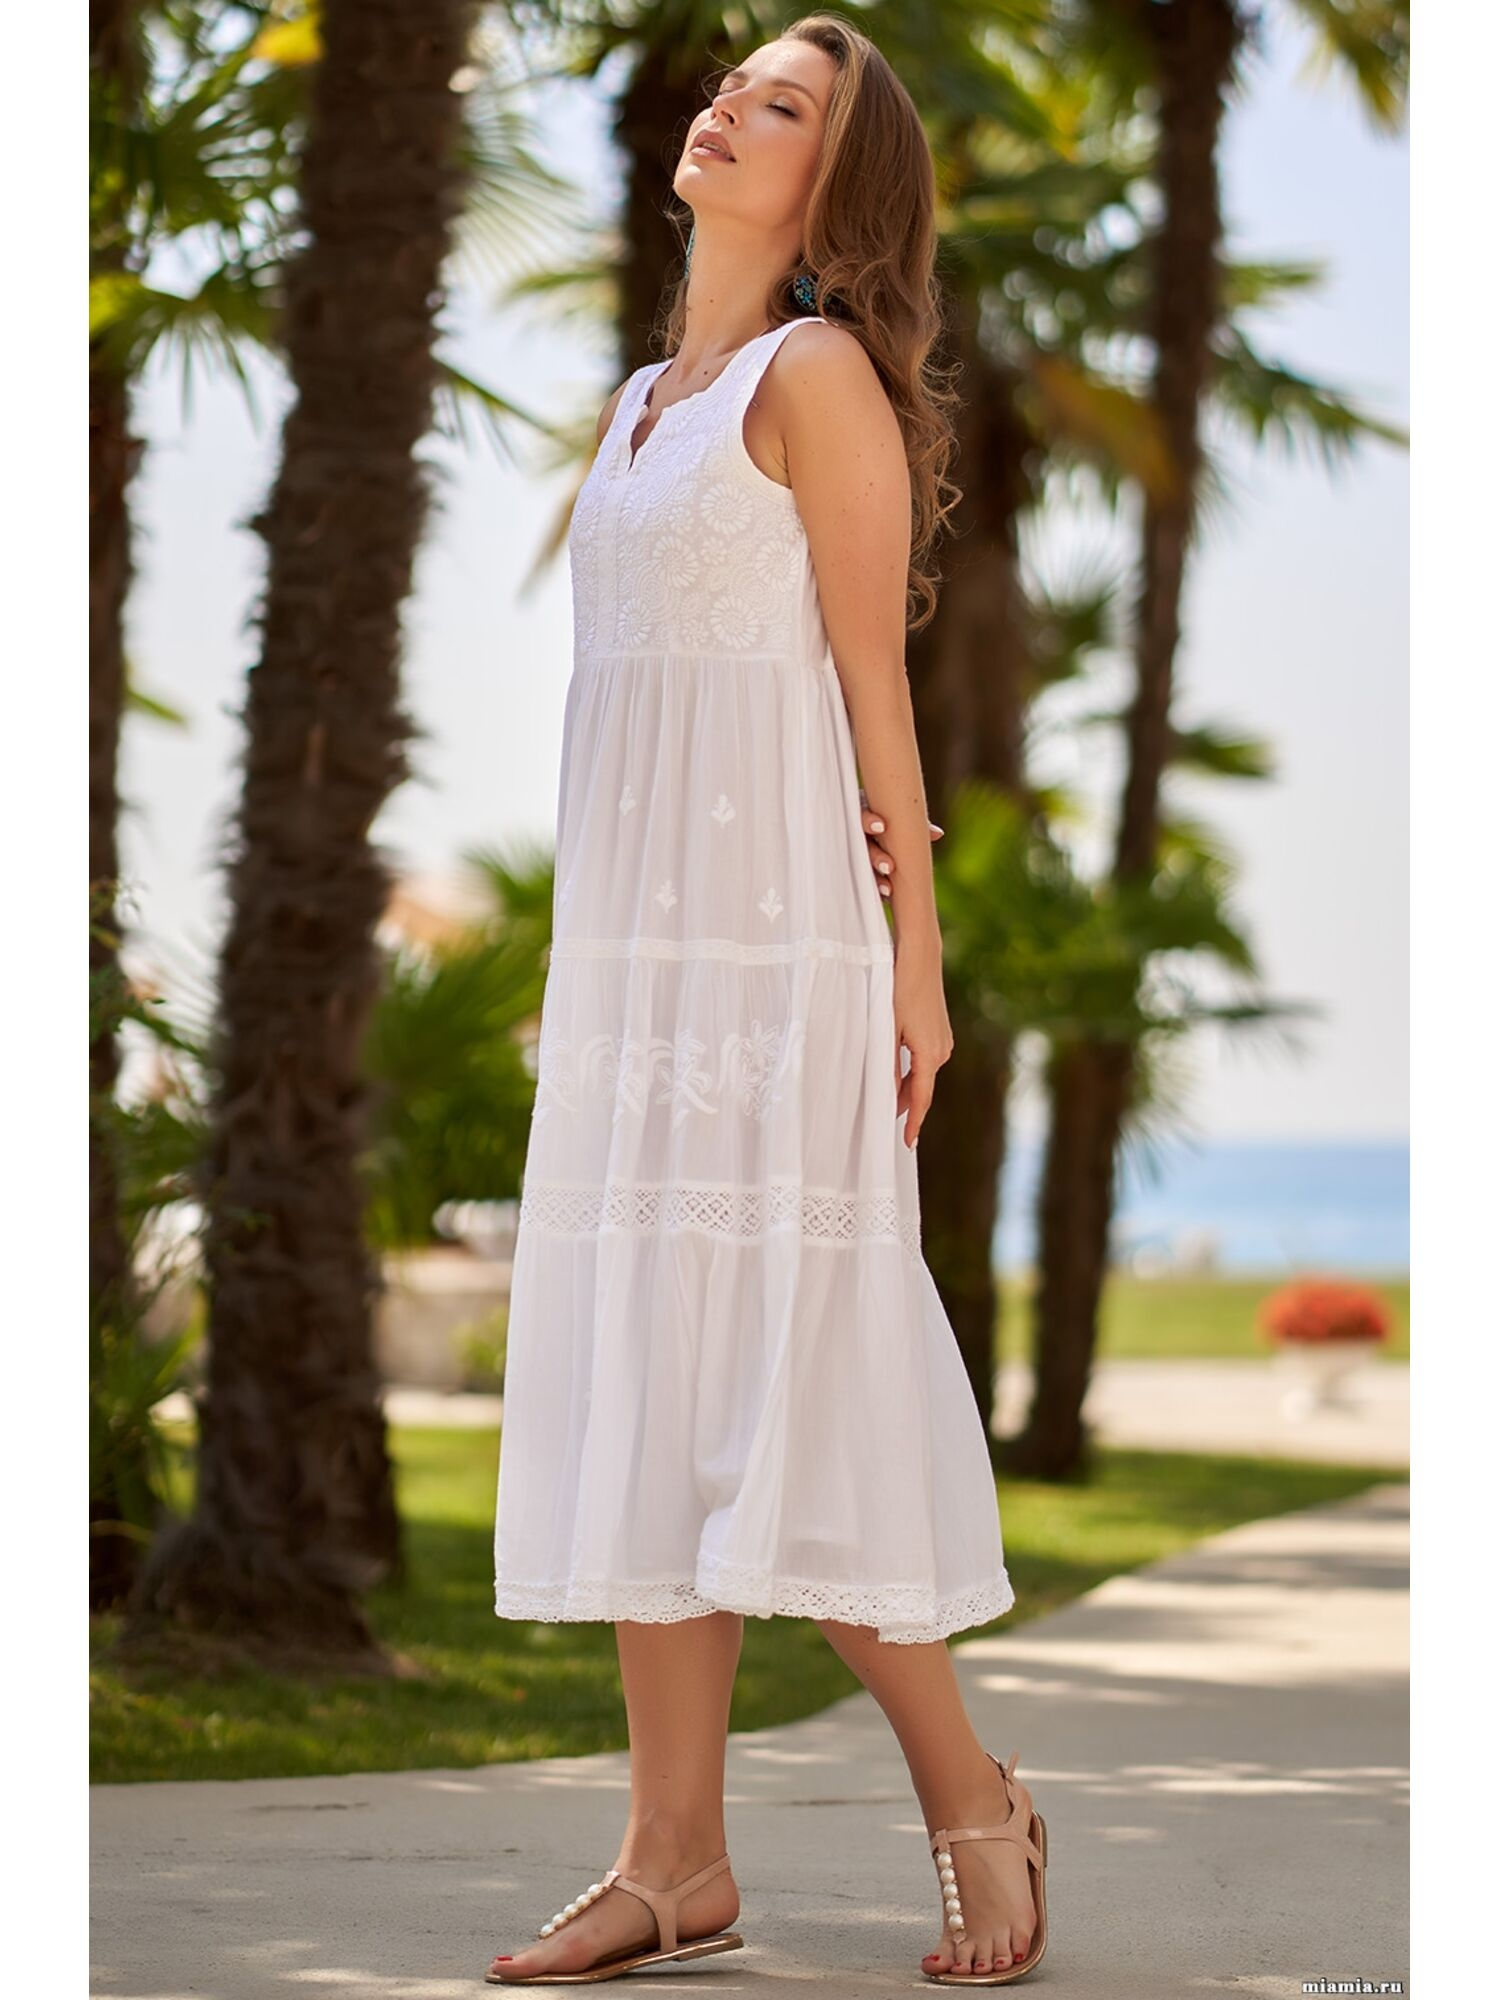 Сарафан, туника пляжная хлопковая Доминикана 1377, белый, Mia-Amore